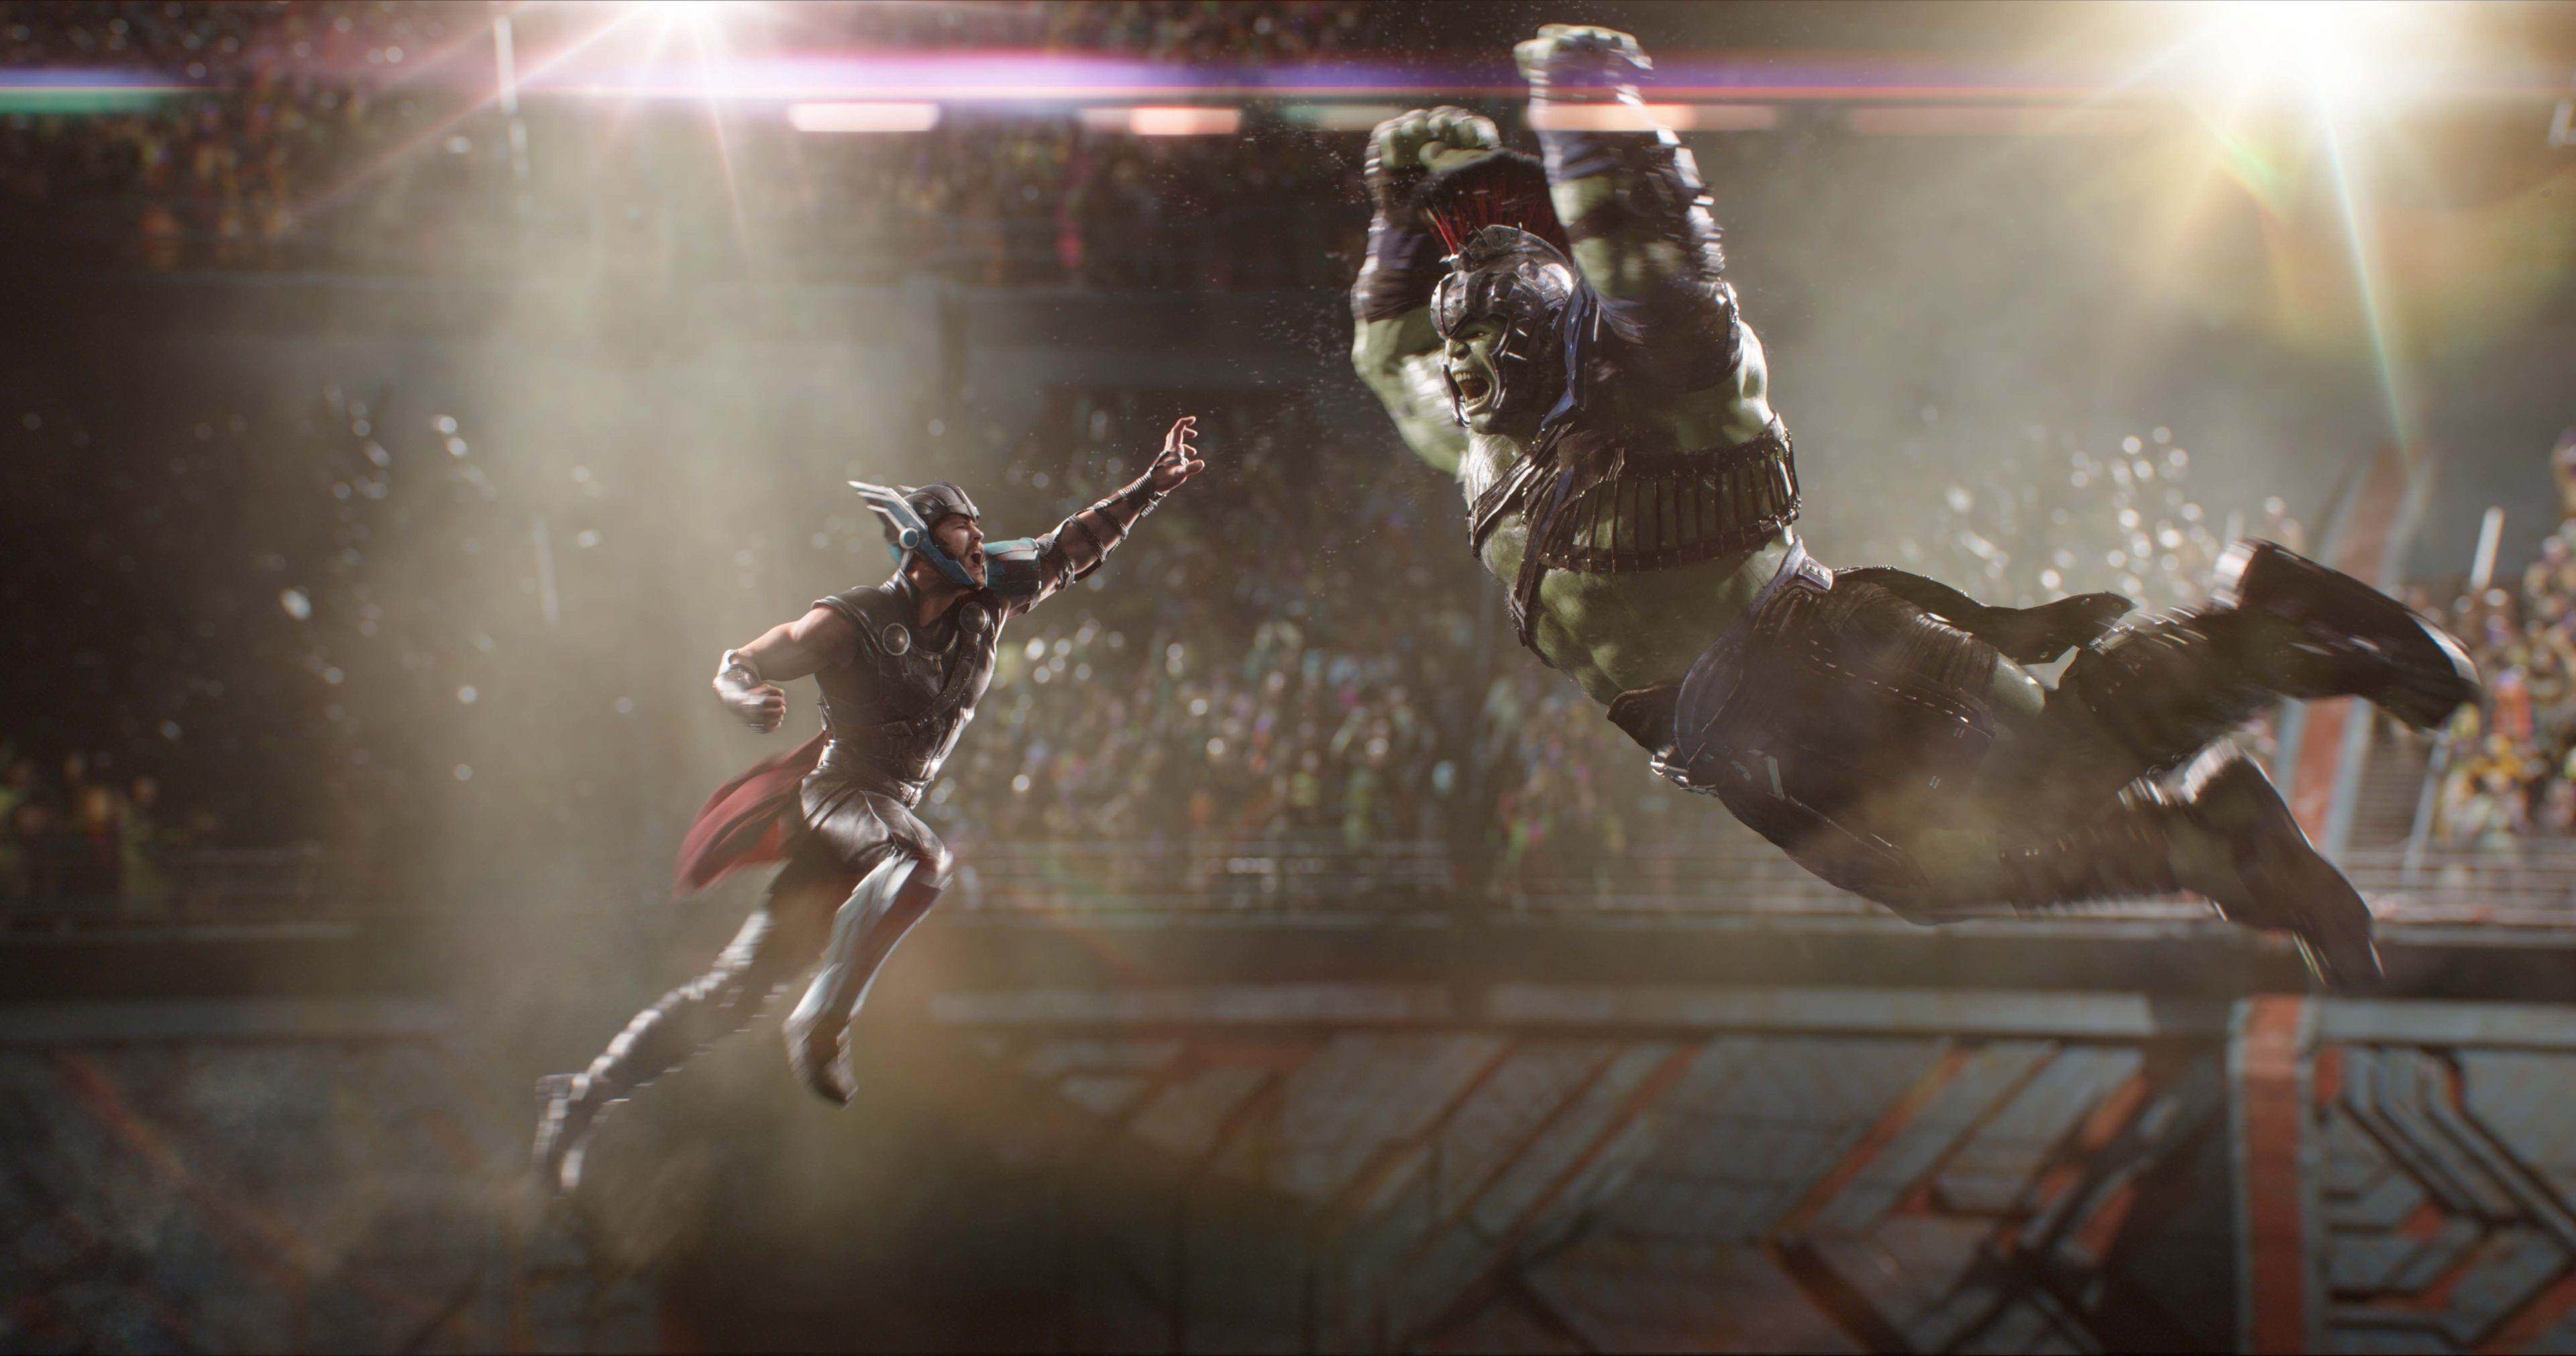 3840x2021 Thor Ragnarok 4k Hd Wallpaper For Pc Download Chris Hemsworth Mark Ruffalo Thor